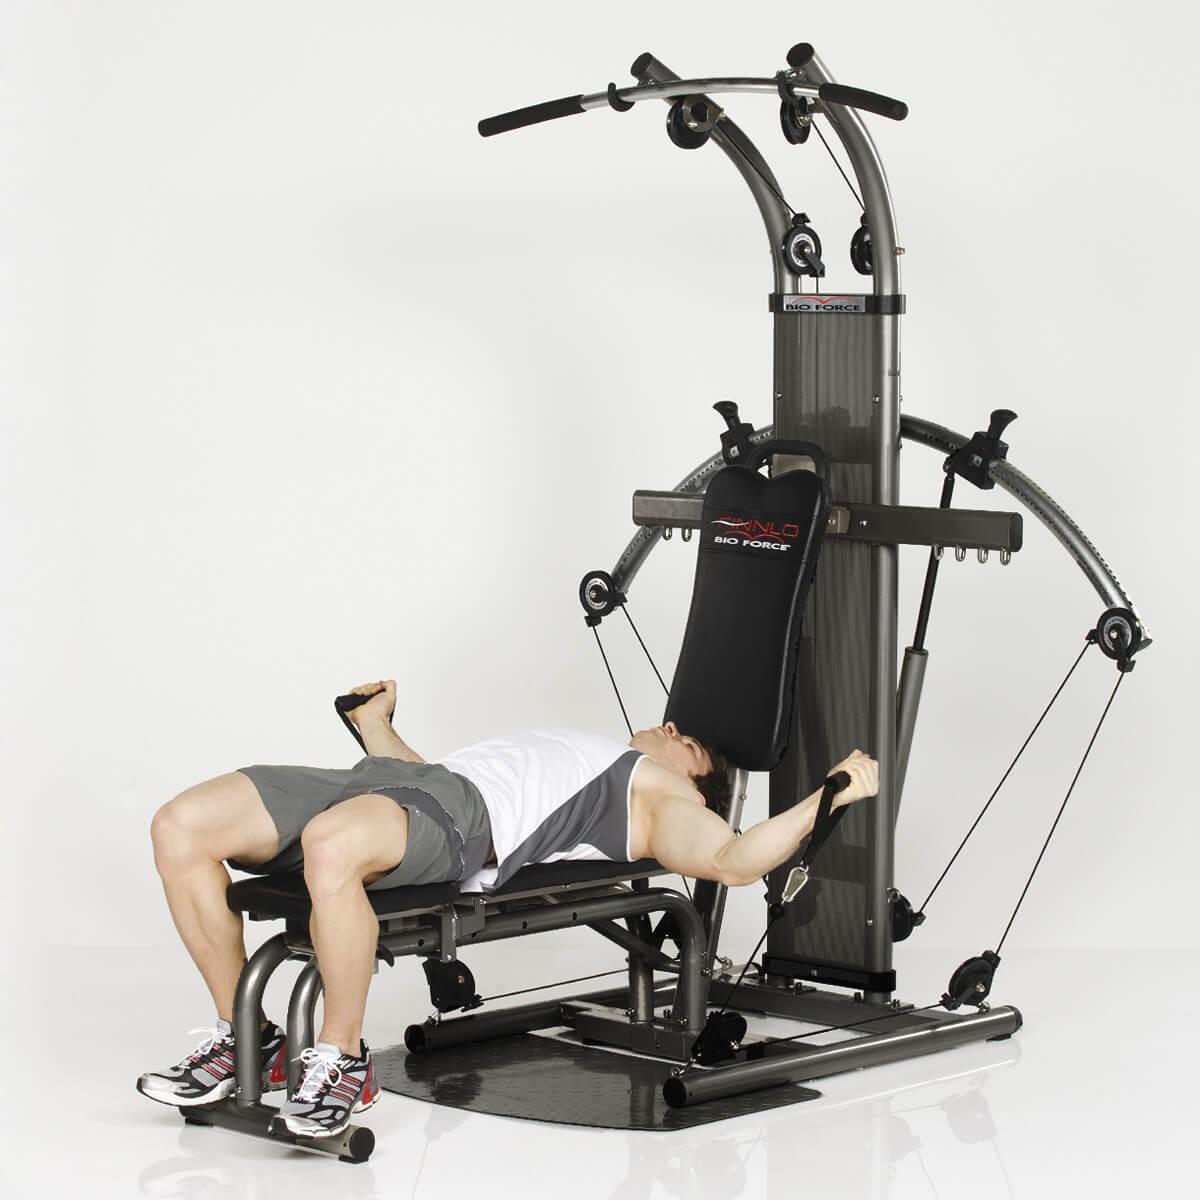 Finnlo Multi Gym Bio Force Buy Now